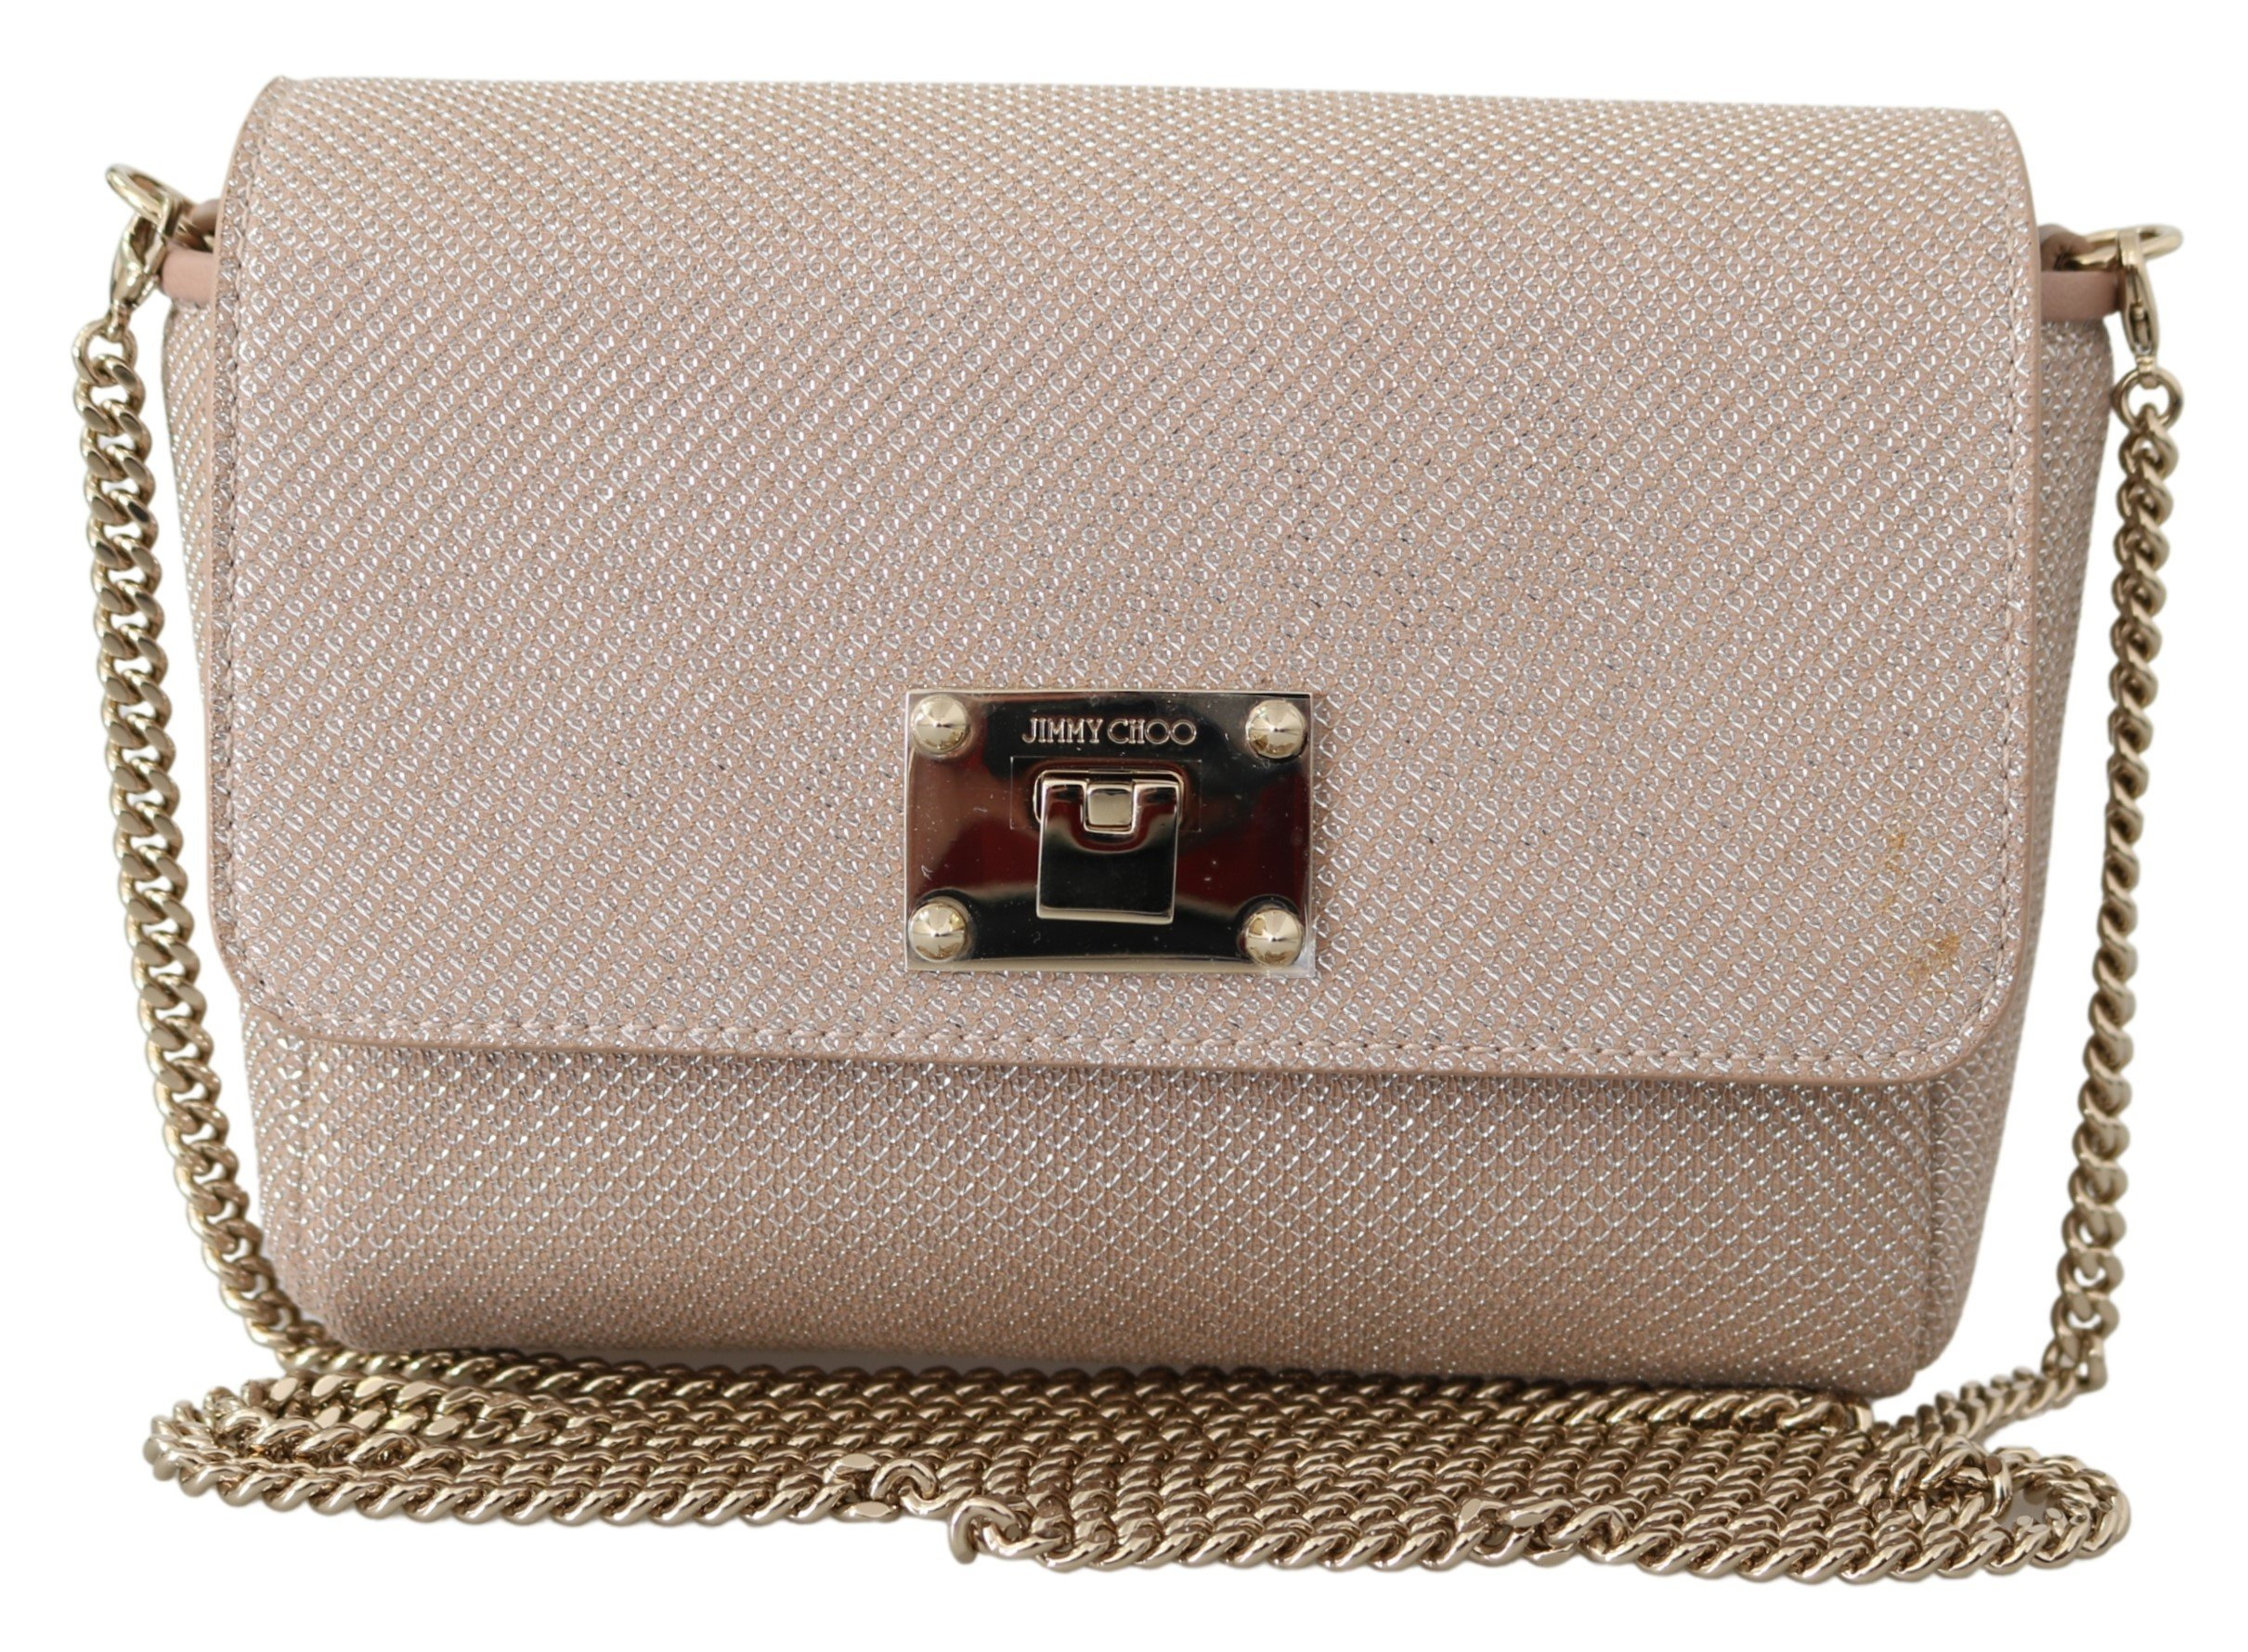 Jimmy Choo Women's Ruby Lace Crossbody Bag Powder Pink 1436027